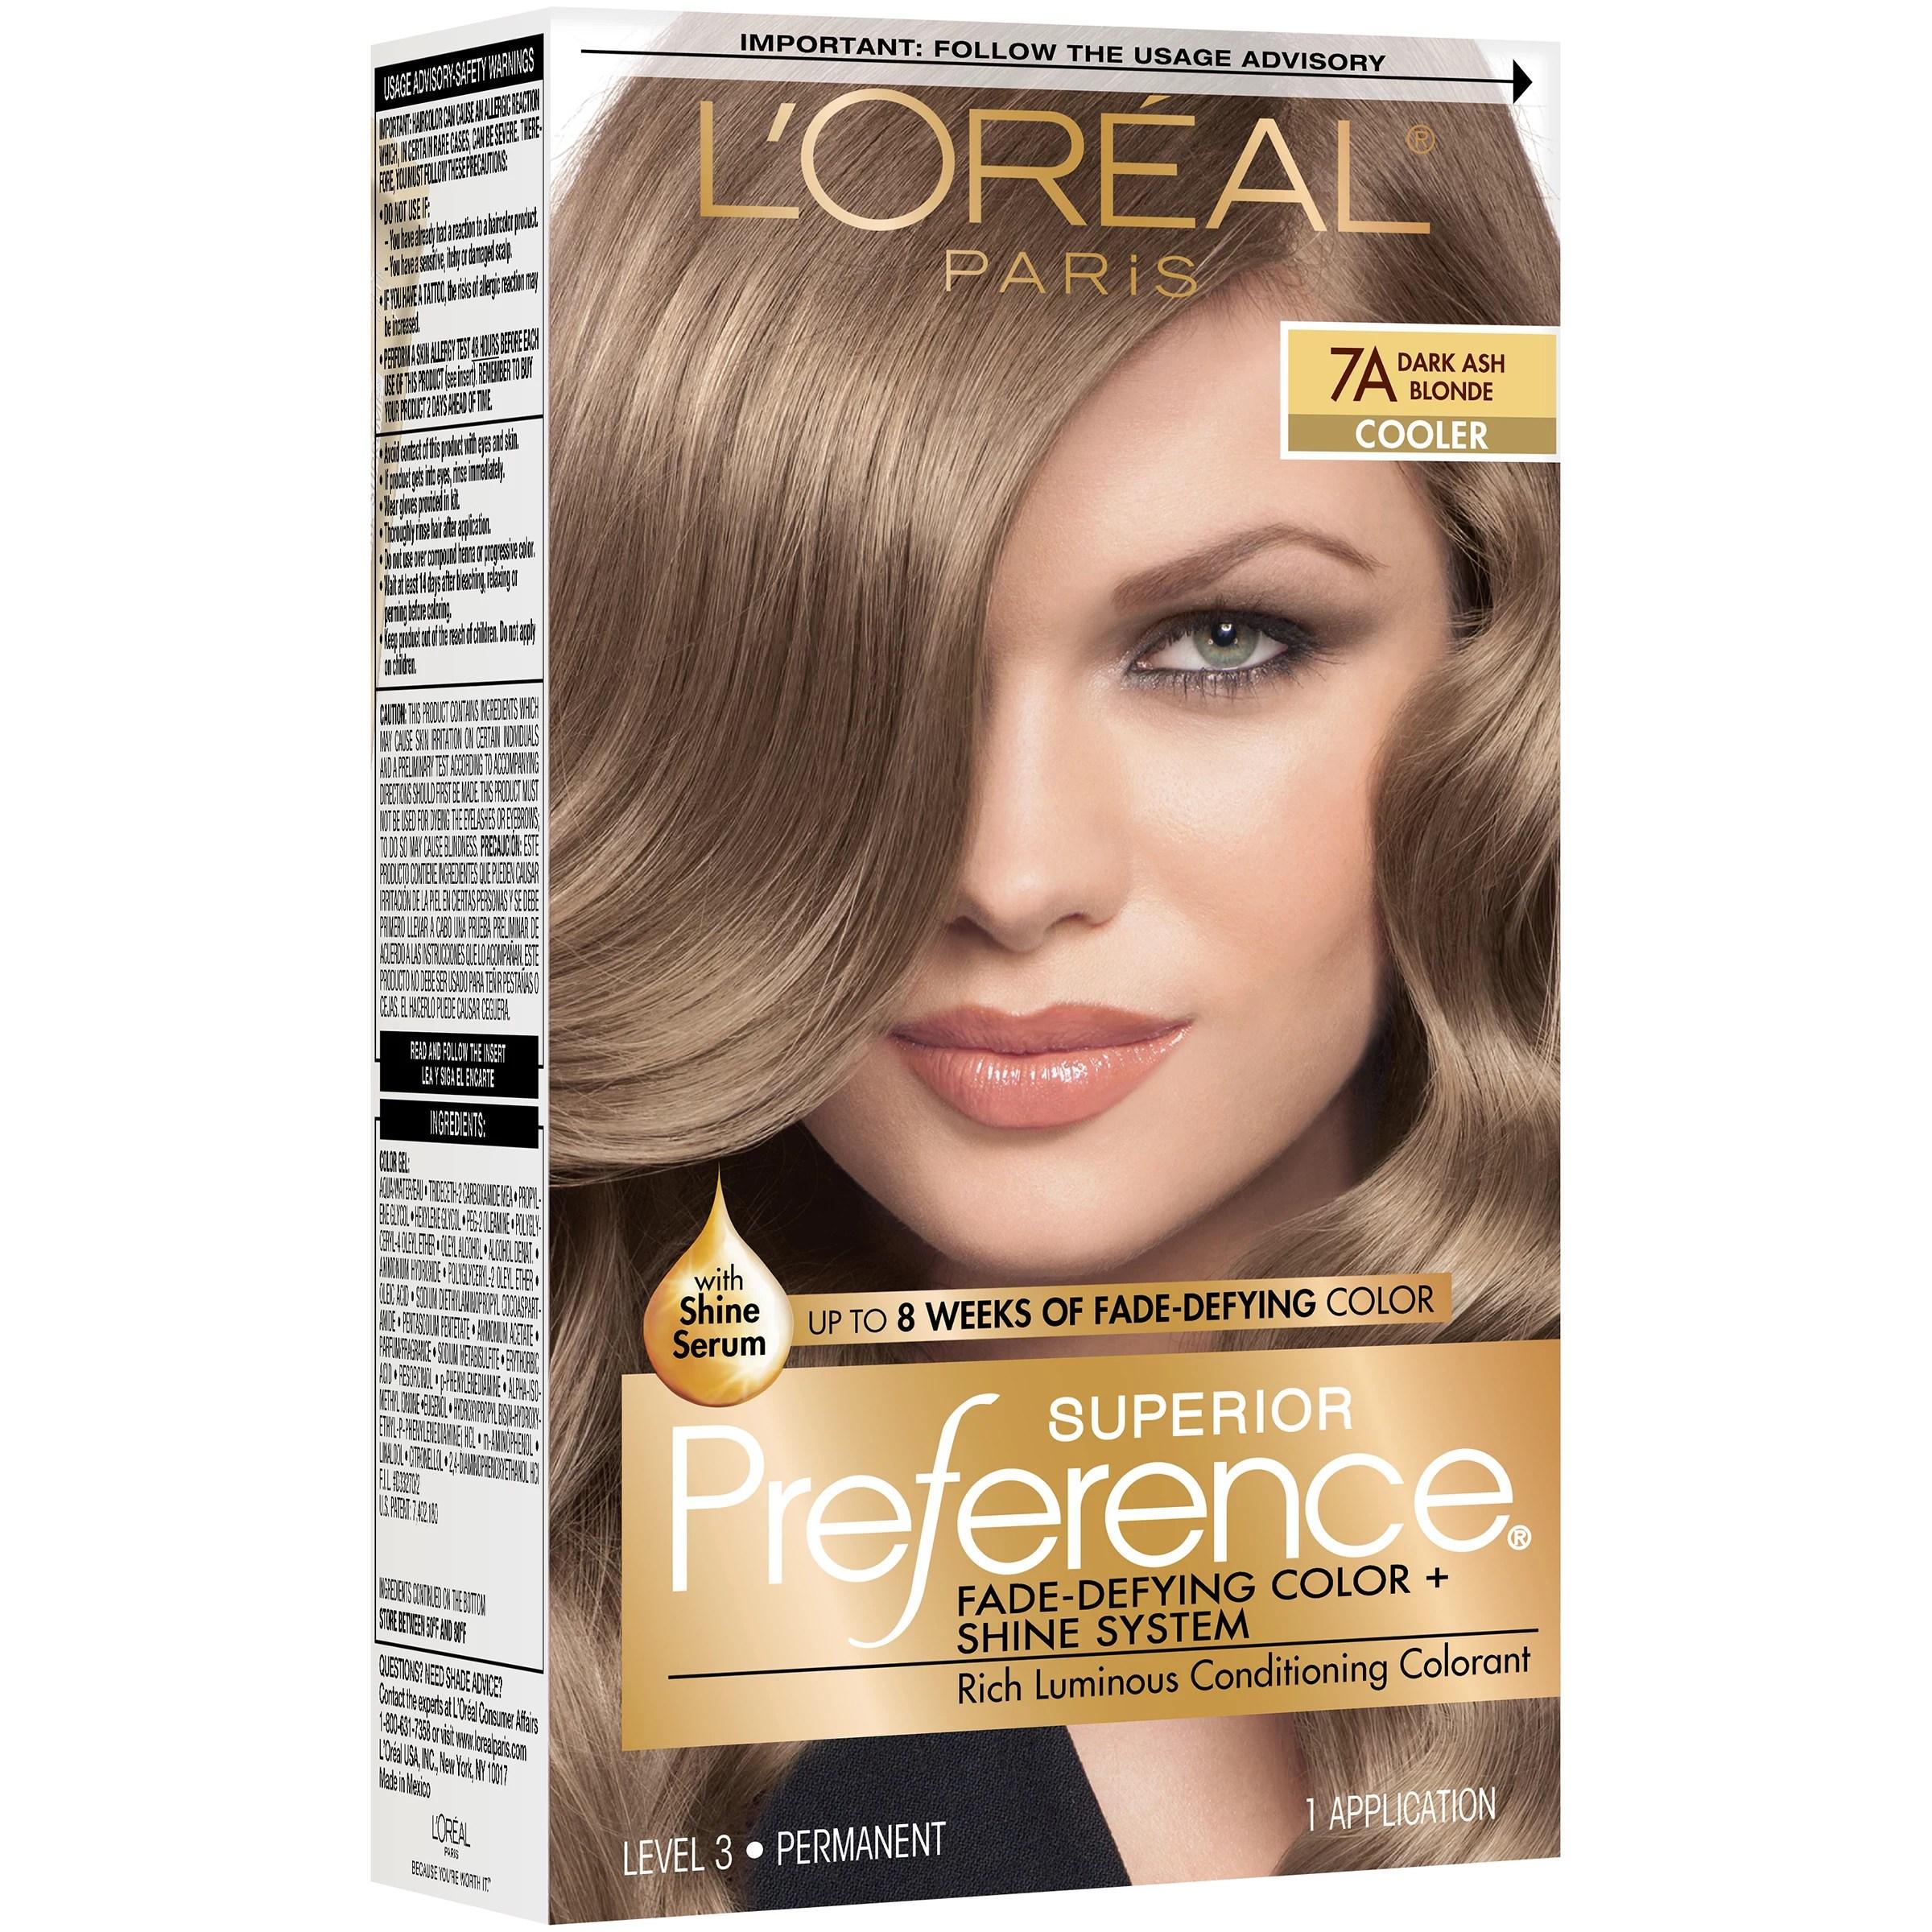 L Oreal Paris Superior Preference Permanent Hair Color 7a Dark Ash Blonde Shop Hair Color At H E B